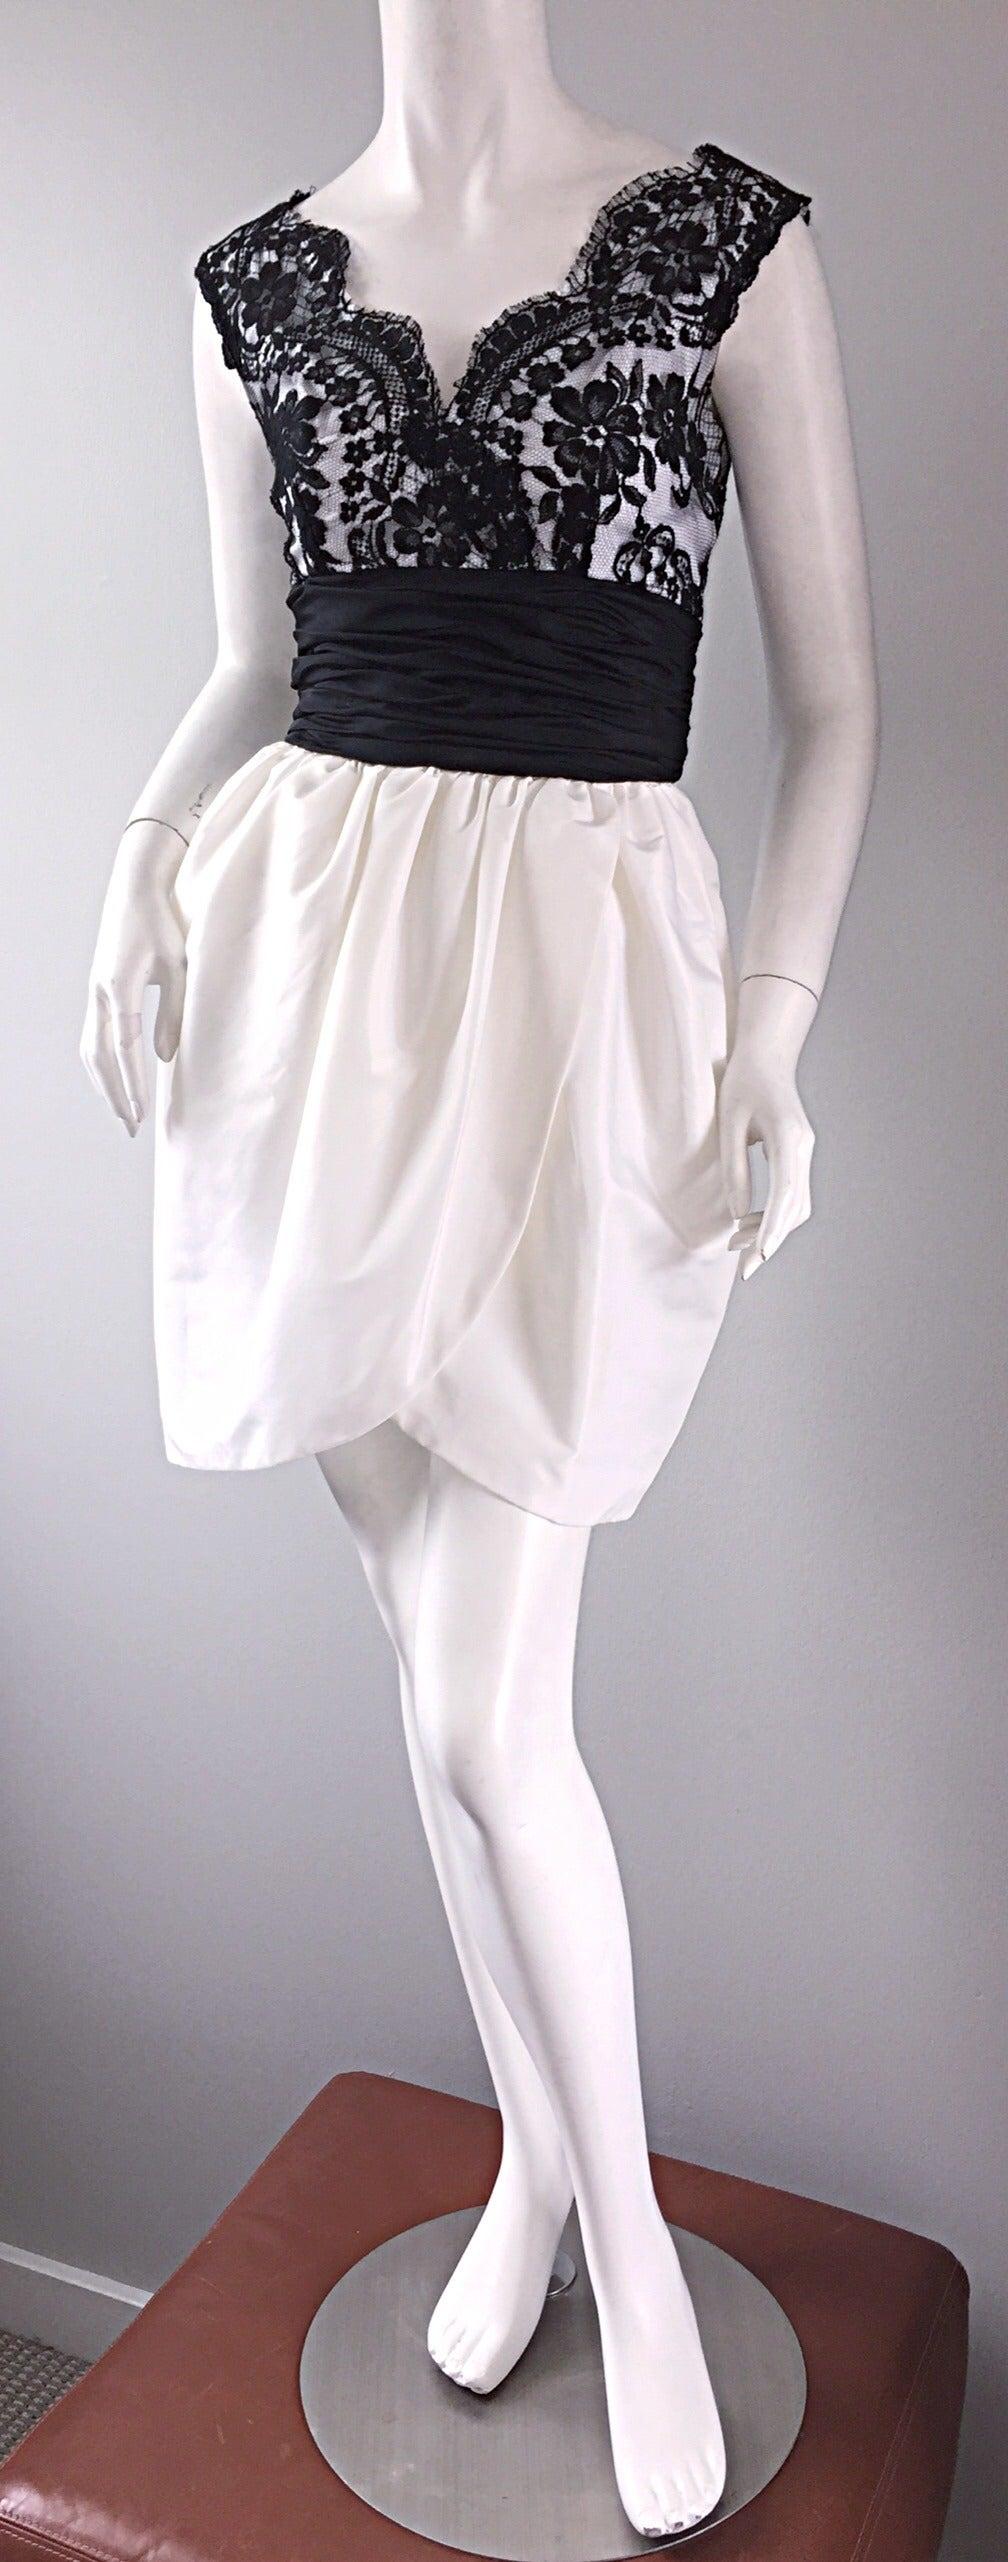 Vintage Victor Costa Black + White Silk Taffeta Lace Cocktail Dress 8